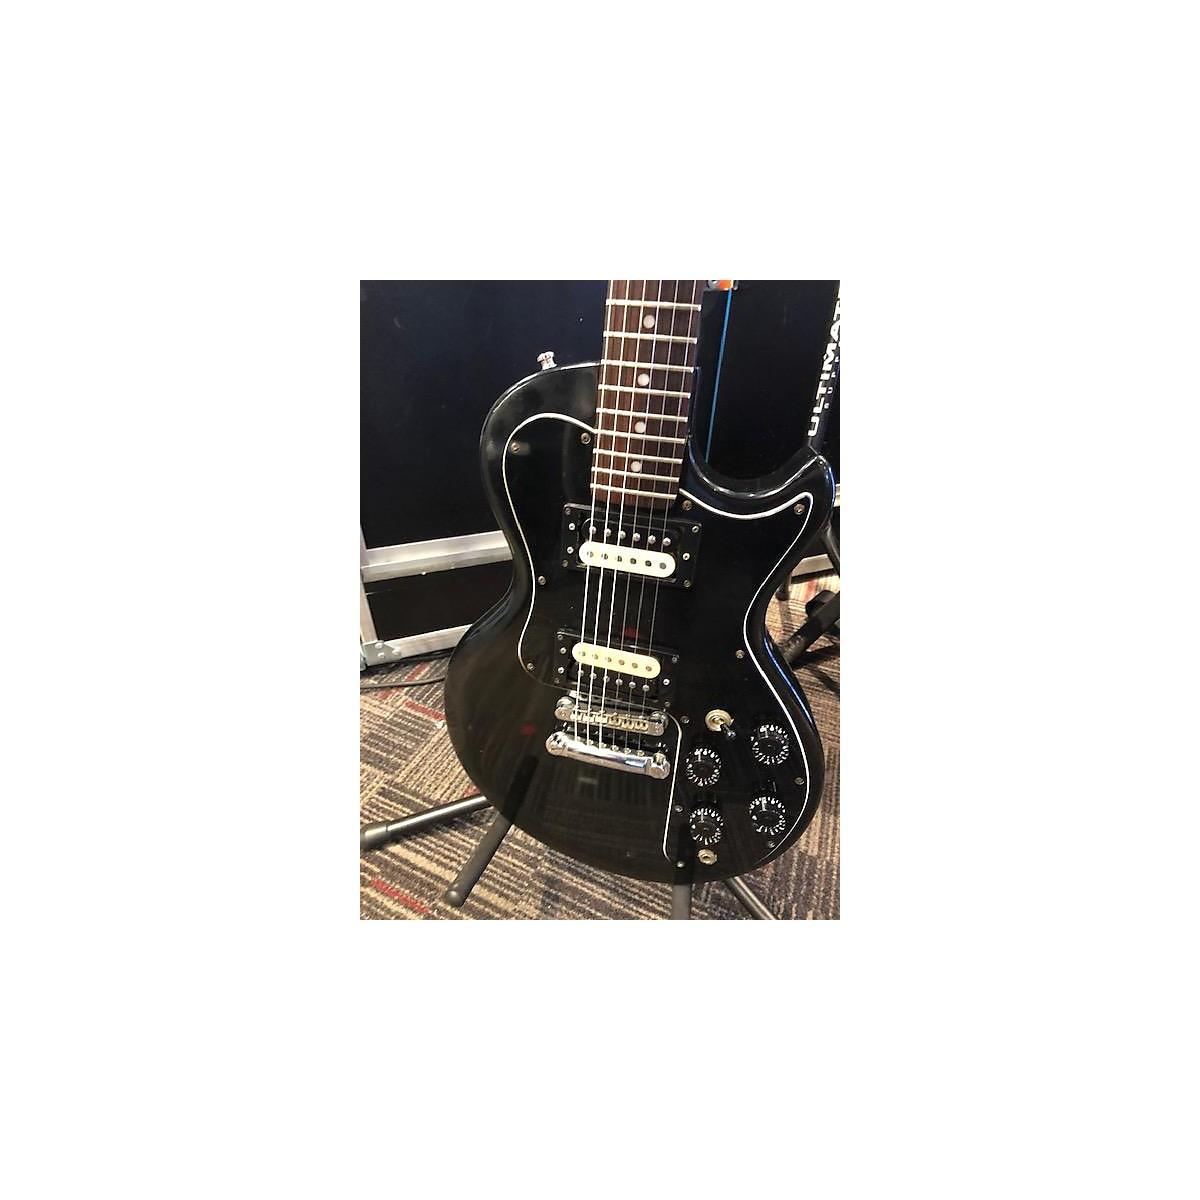 Gibson 1981 Sonex 180 Deluxe Solid Body Electric Guitar